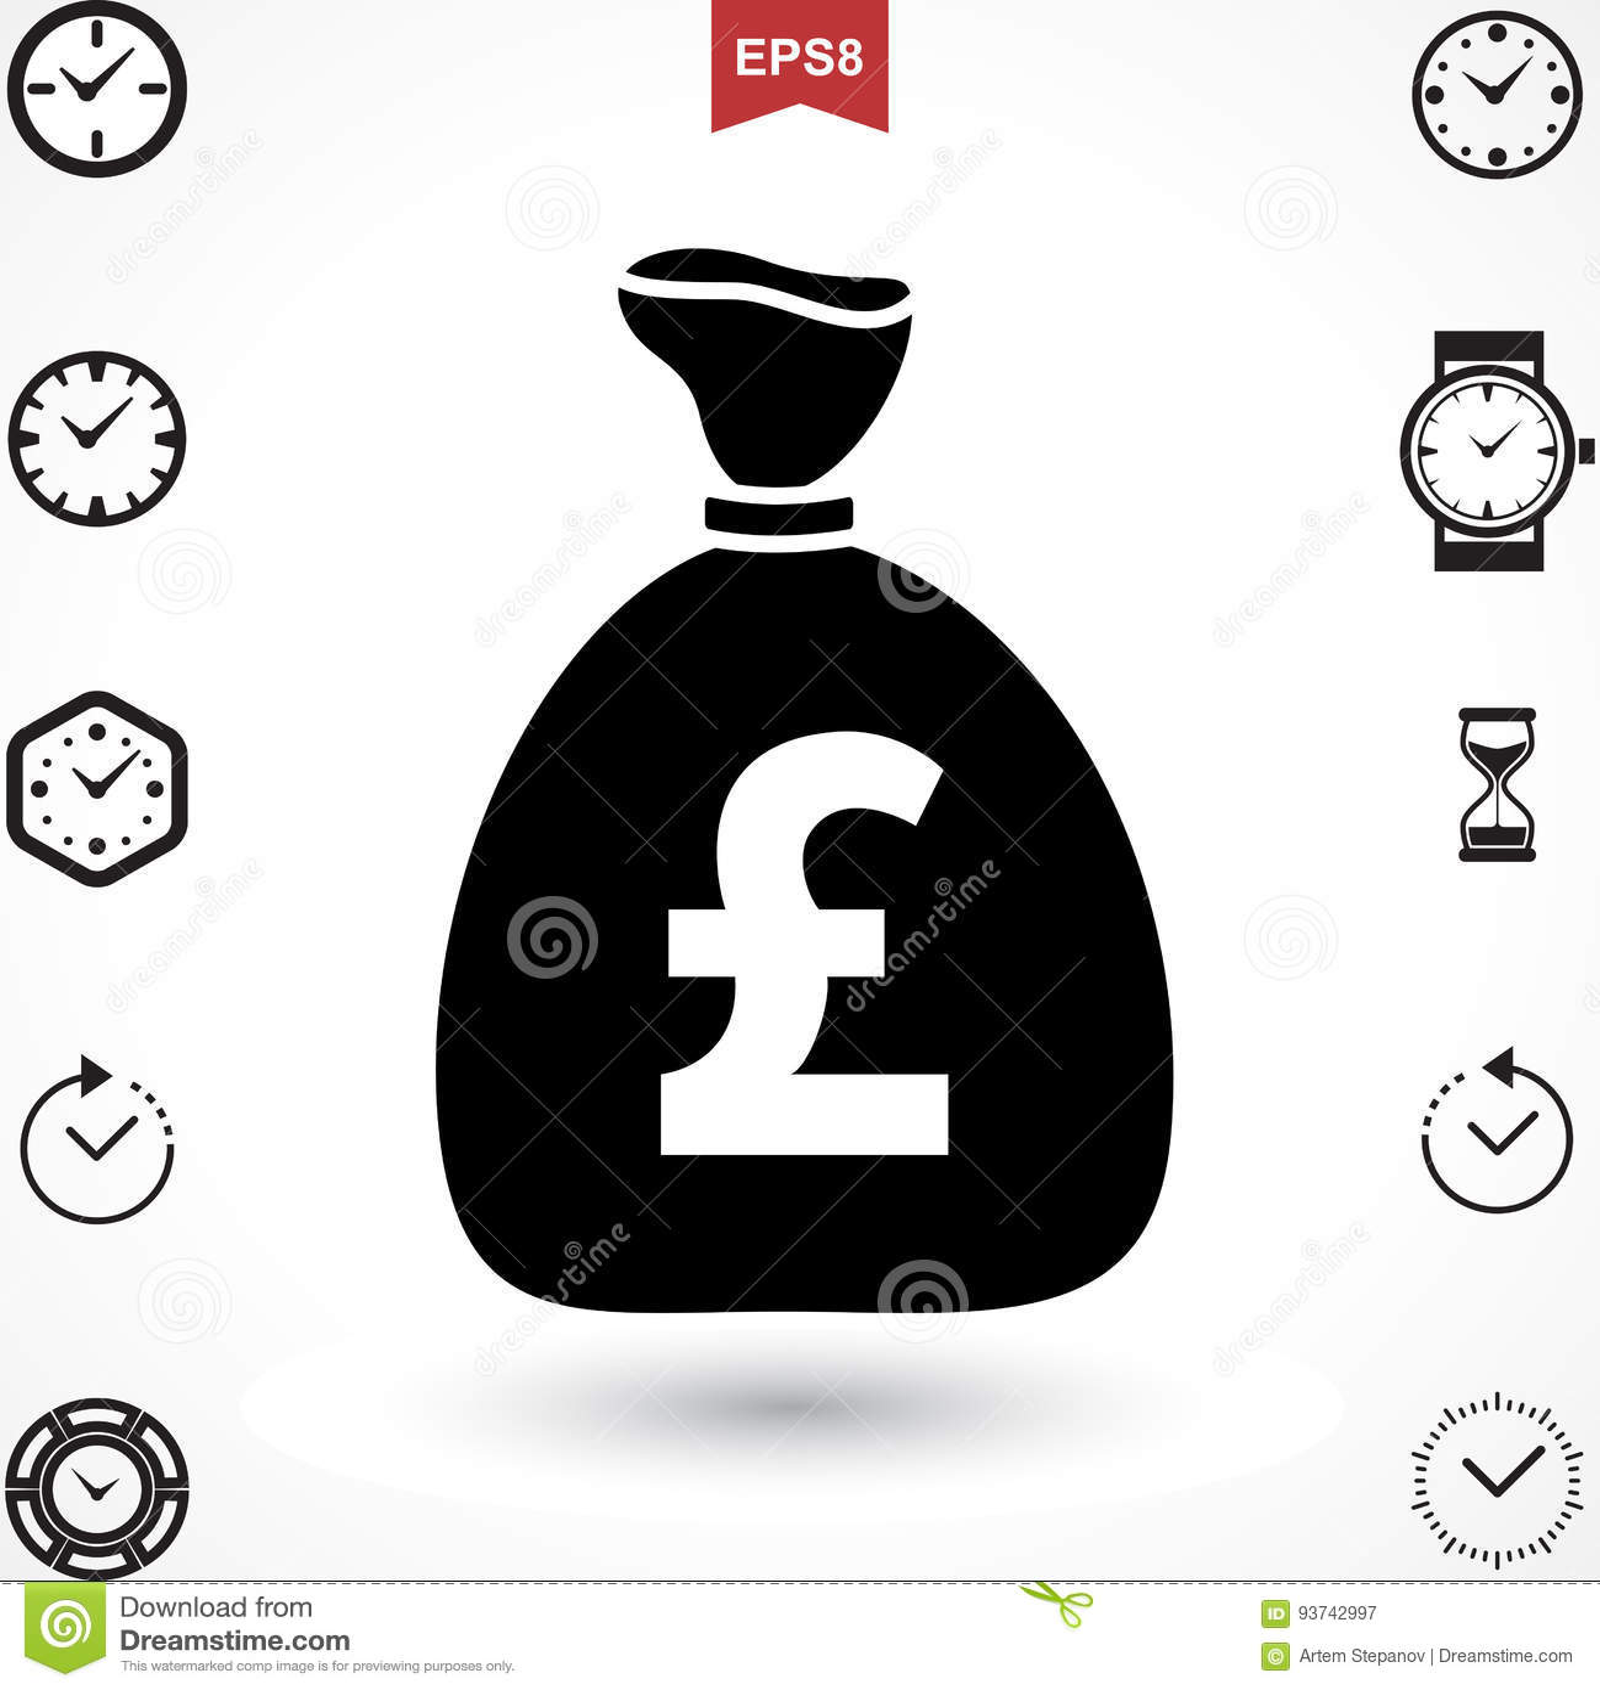 Pound Vector Icon Stock Vector Illustration Of Money 93742997